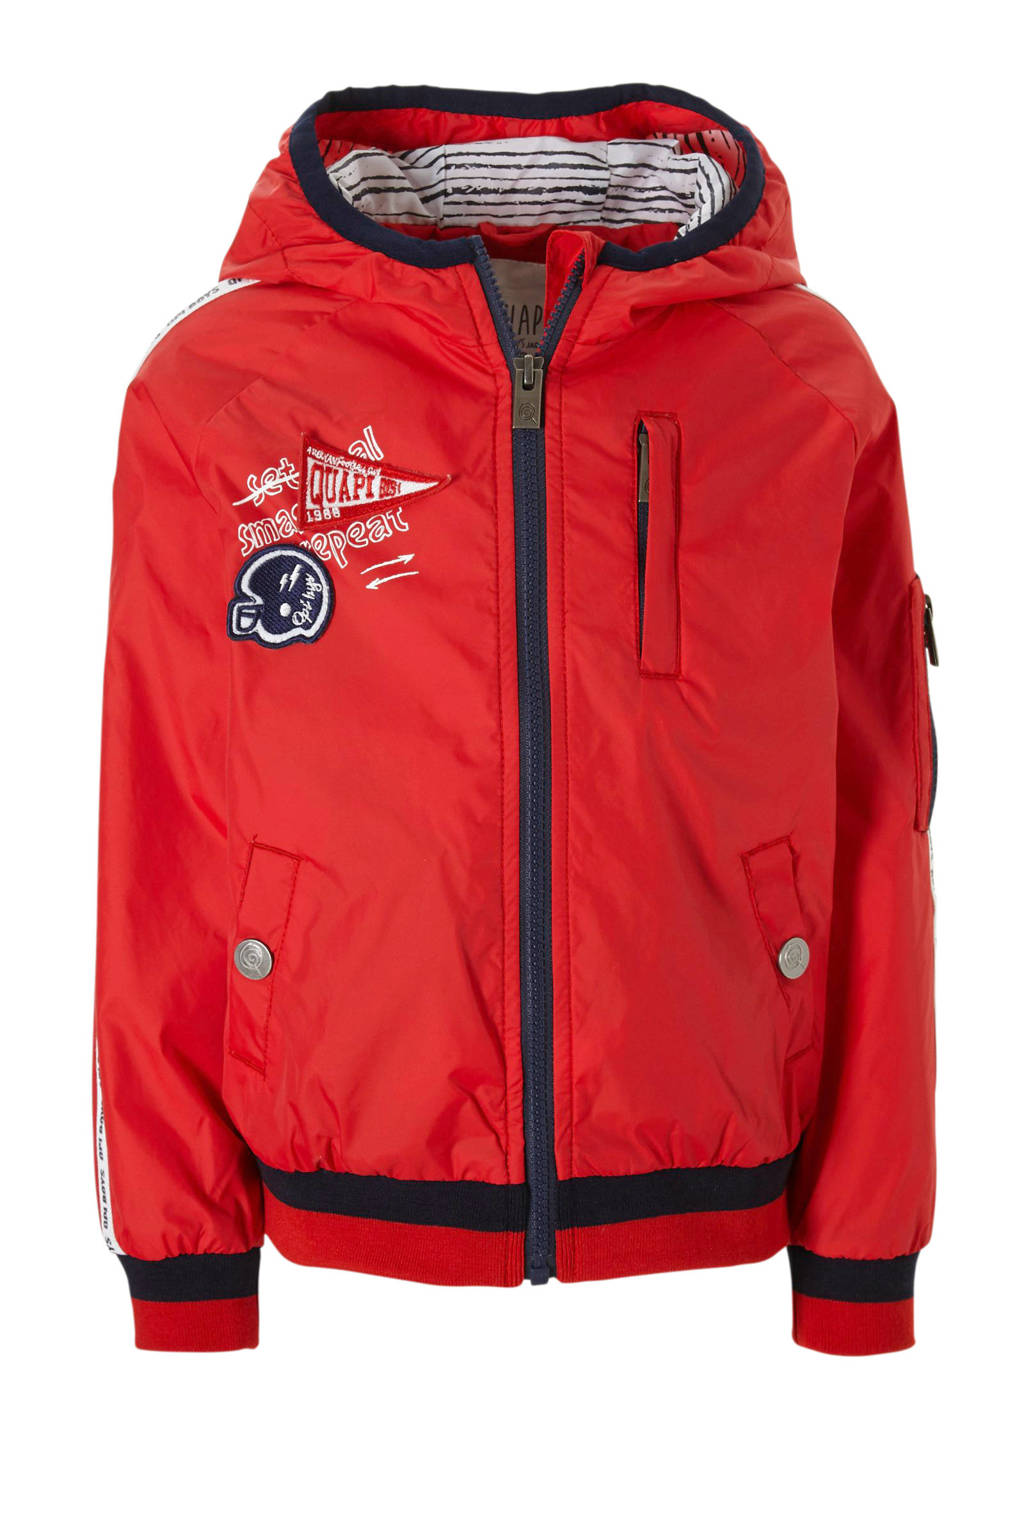 Quapi zomerjas Samo rood, Rood/donkerblauw